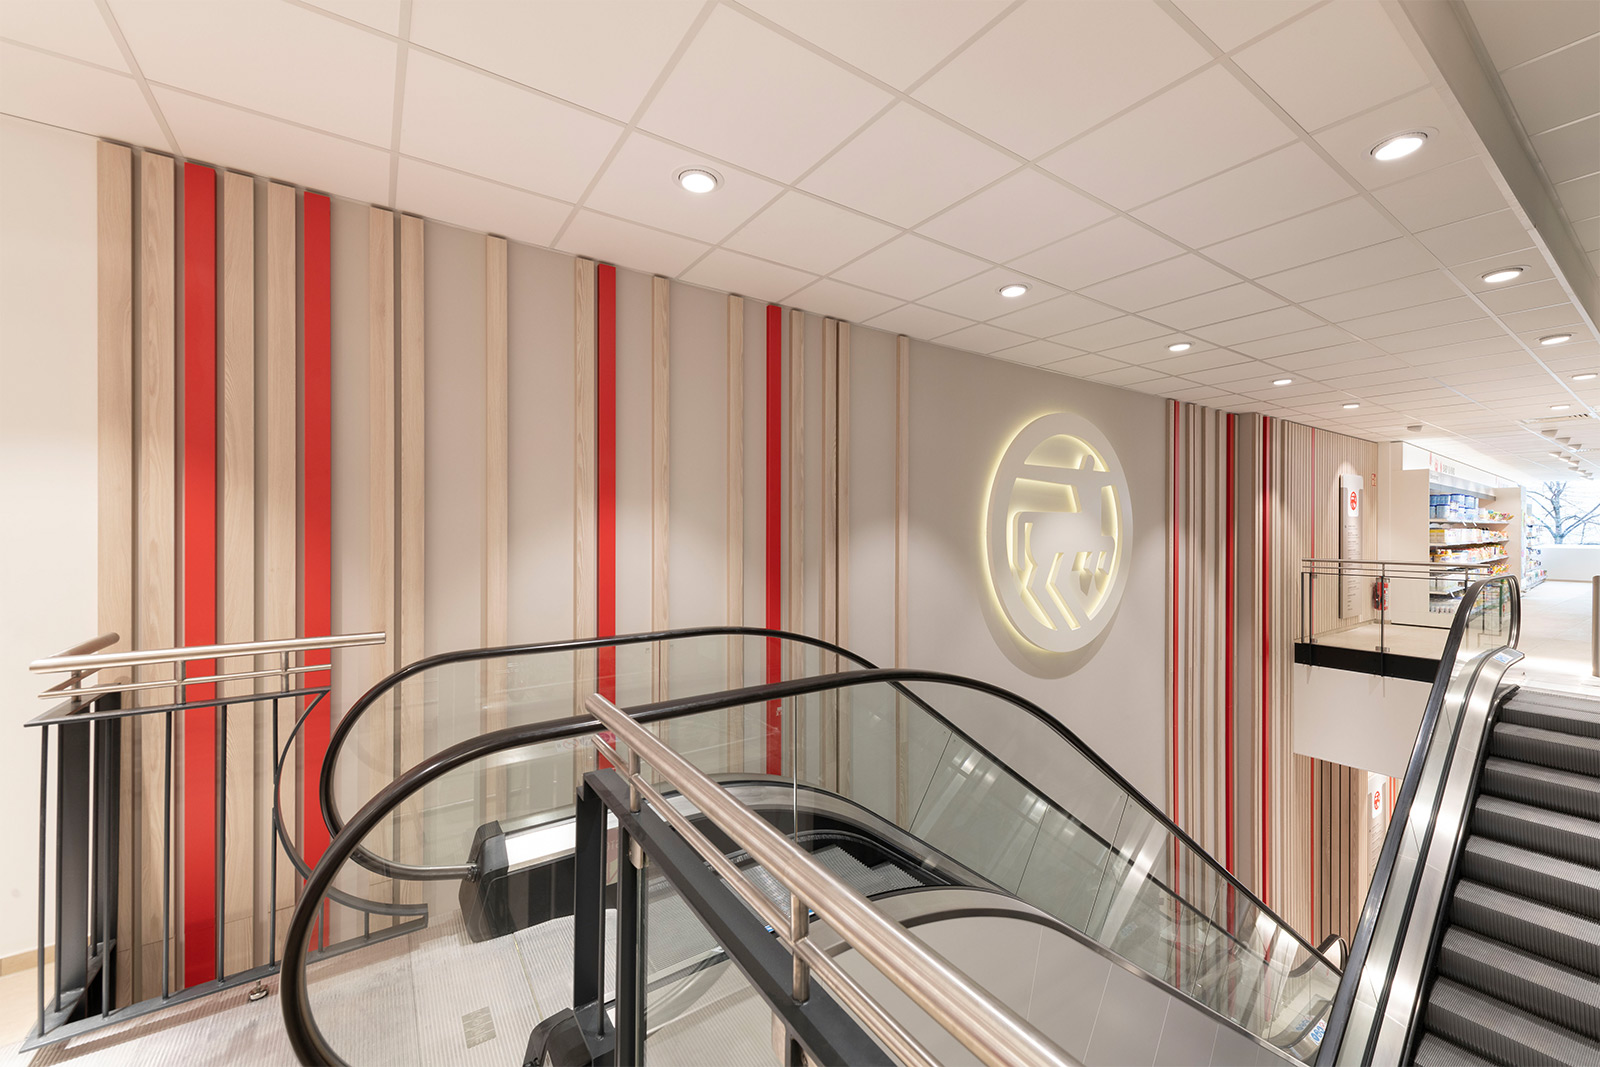 Rossmann Filiale Nürnberg Realisierung der Lamellenfassade im Treppenhaus